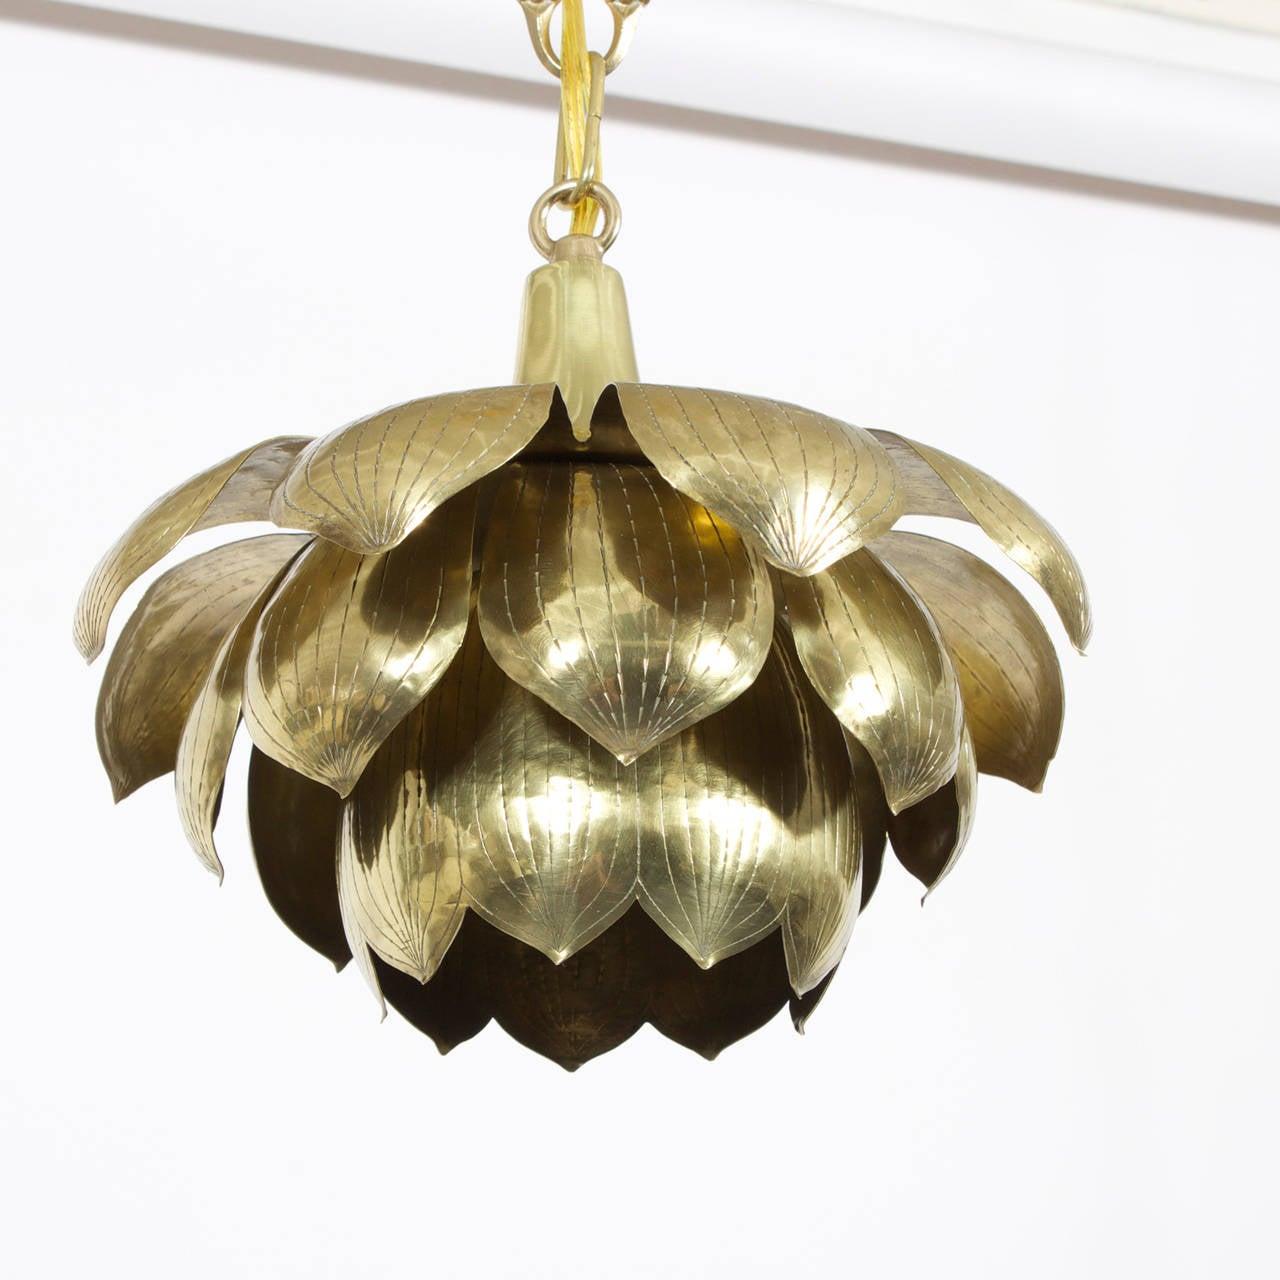 Etched brass lotus pendant light or chandelier at 1stdibs american etched brass lotus pendant light or chandelier for sale aloadofball Images